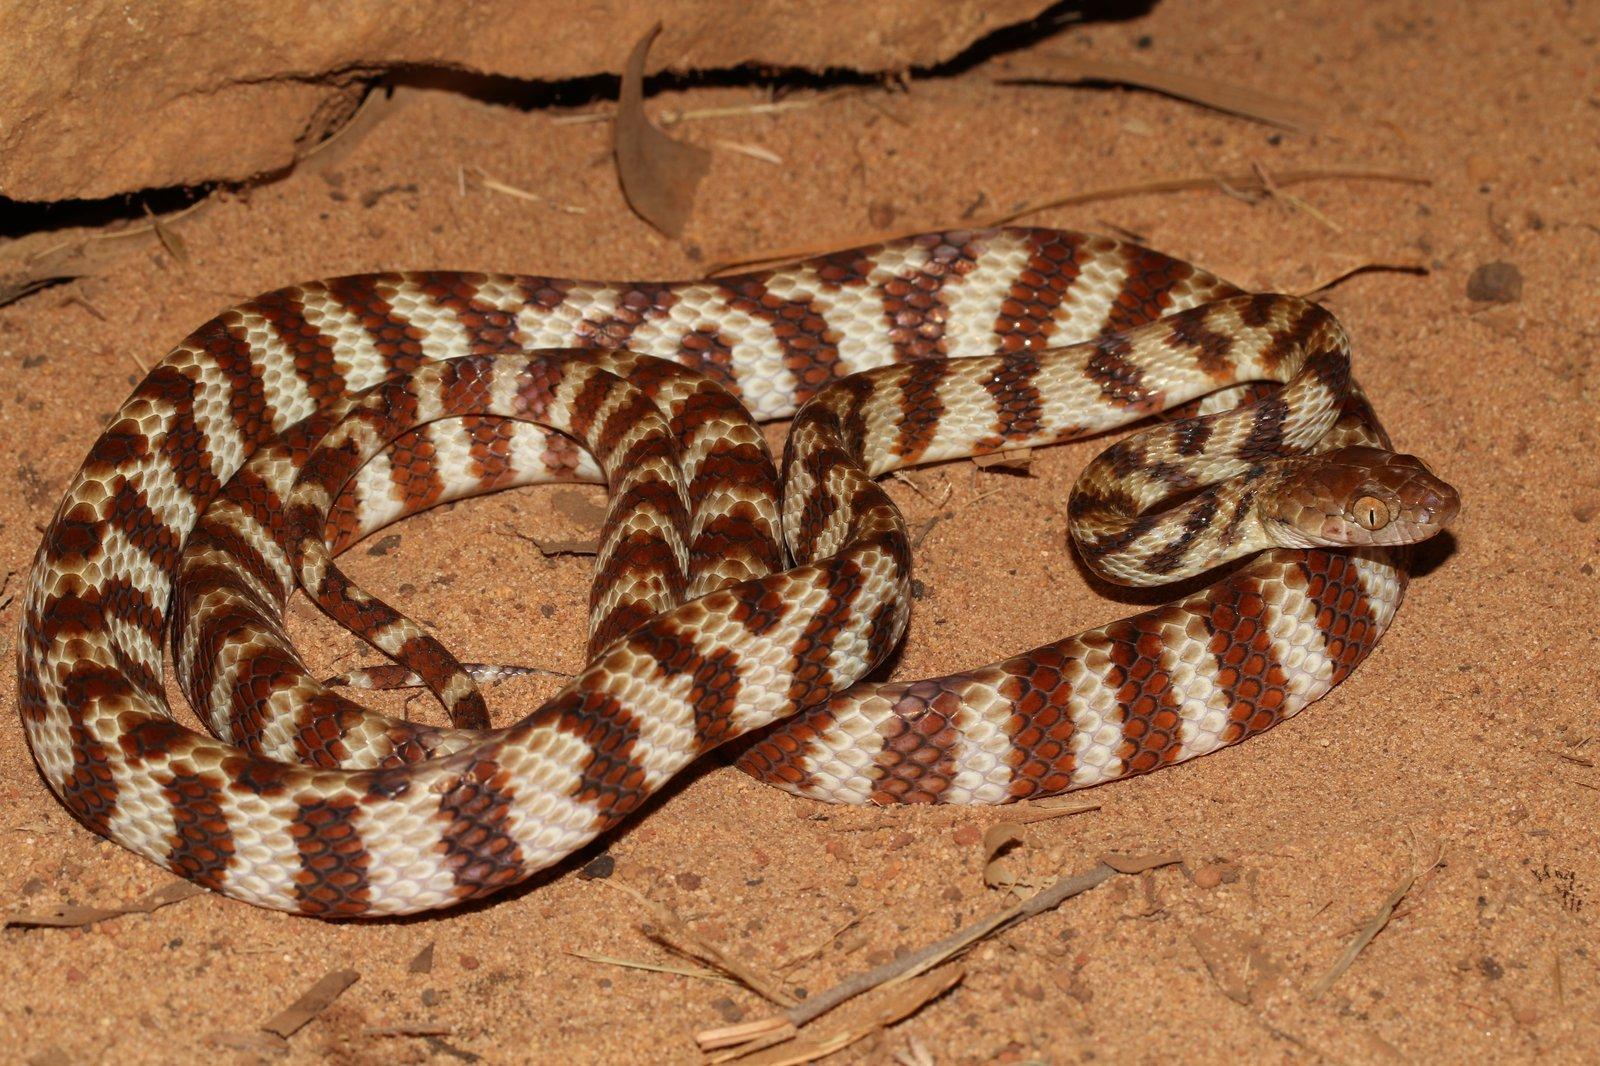 Brown Tree Snake (Boiga irregularis) / Anindilyakwa Language Name - Dumamawurra.